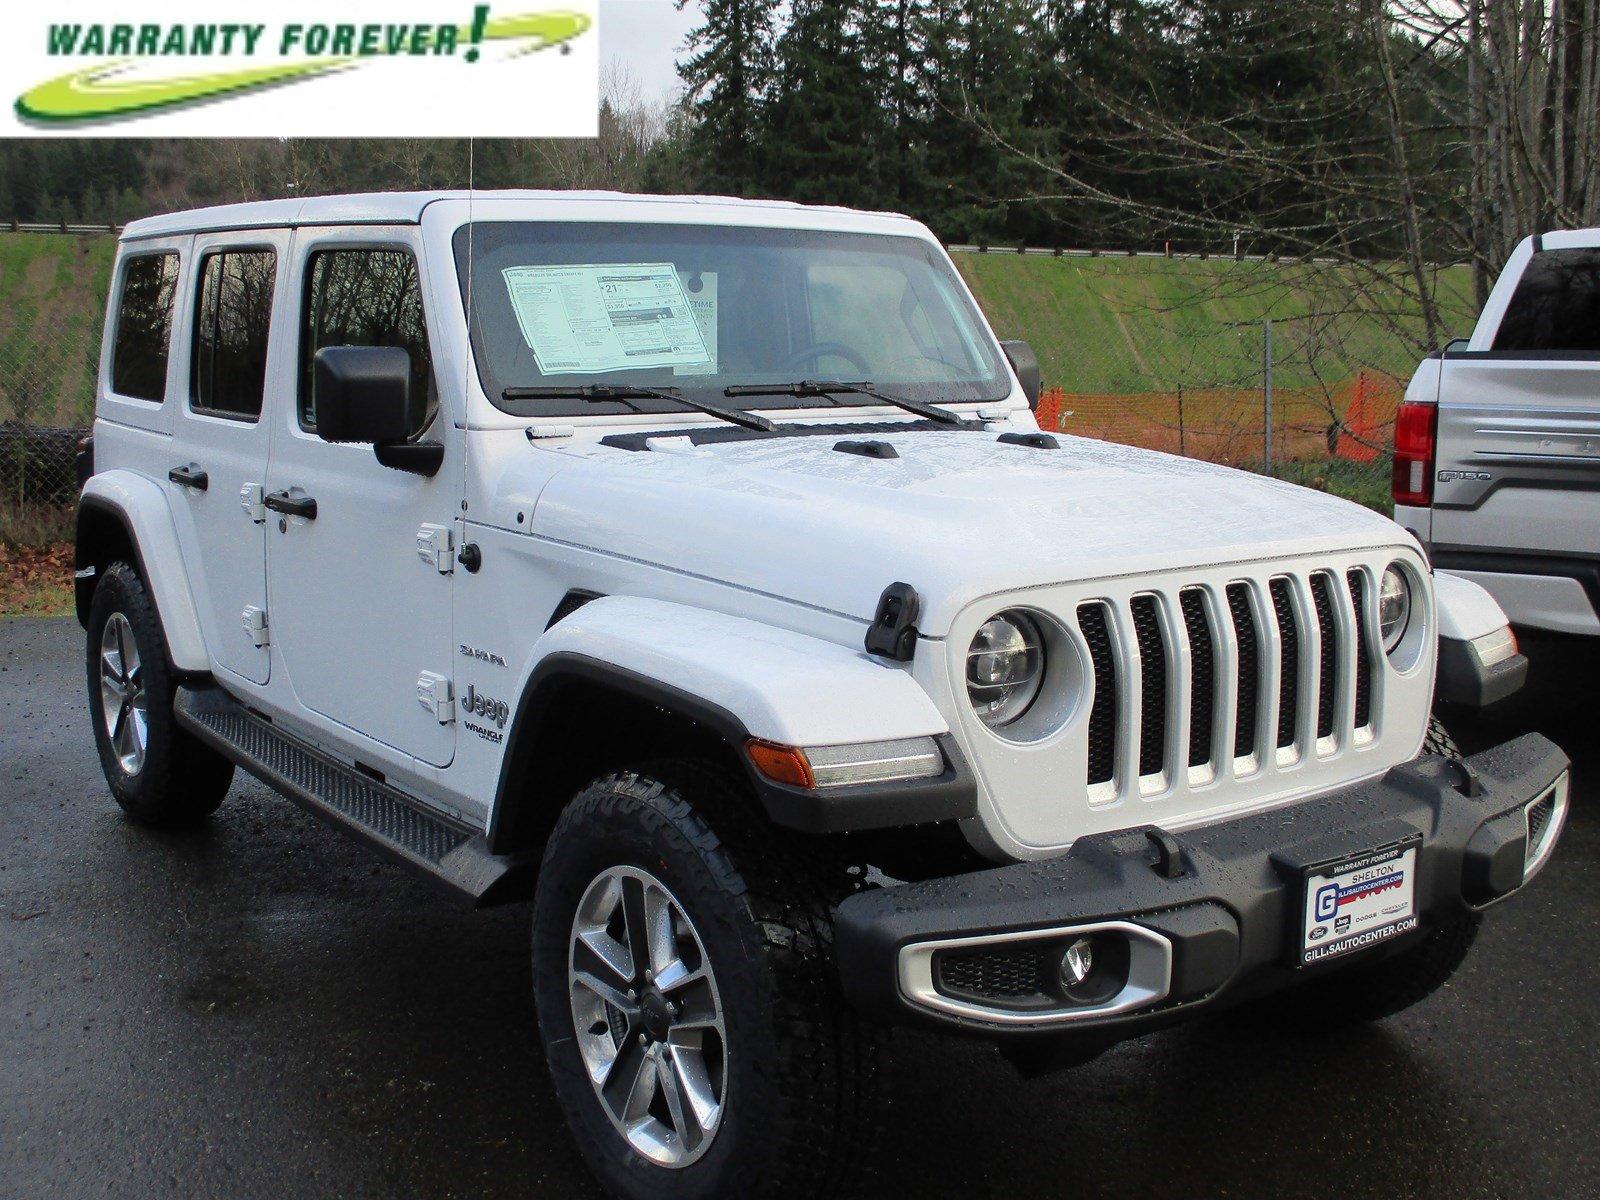 New-2020-Jeep-Wrangler-Unlimited-Sahara-4x4